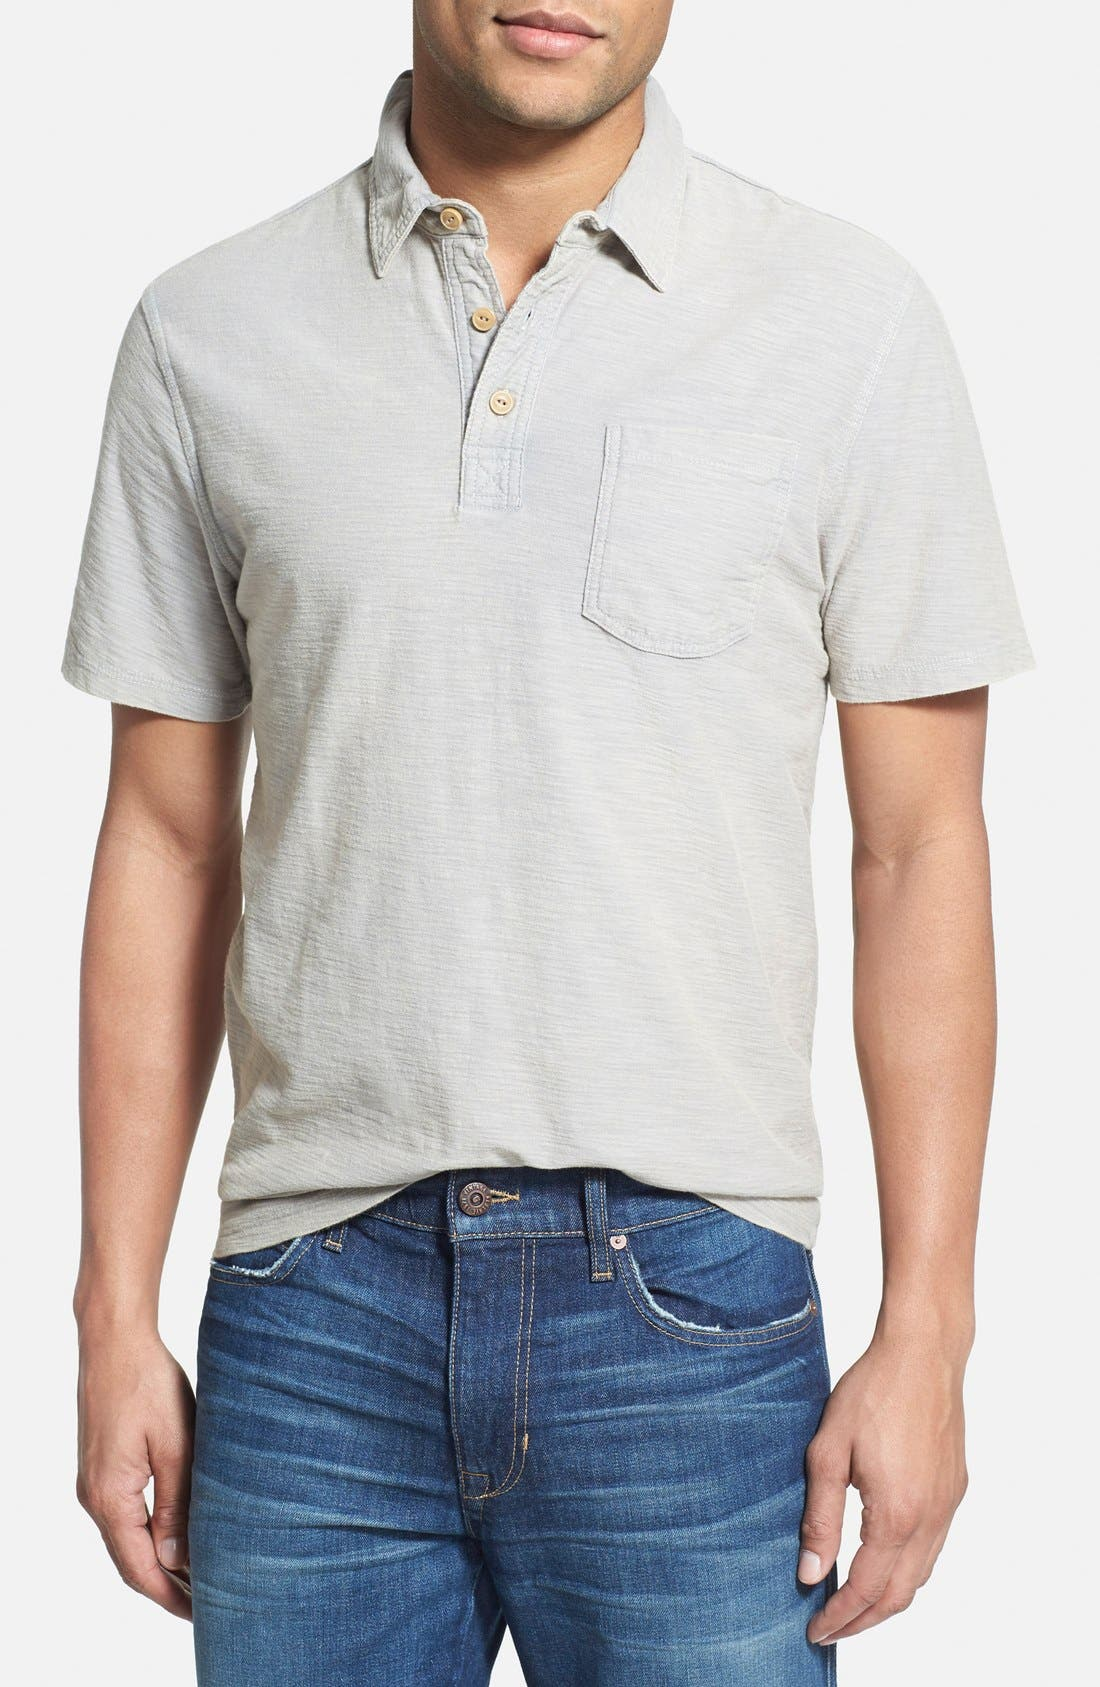 WALLIN & BROS., 'Workwear' Short Sleeve Polo, Main thumbnail 1, color, 030